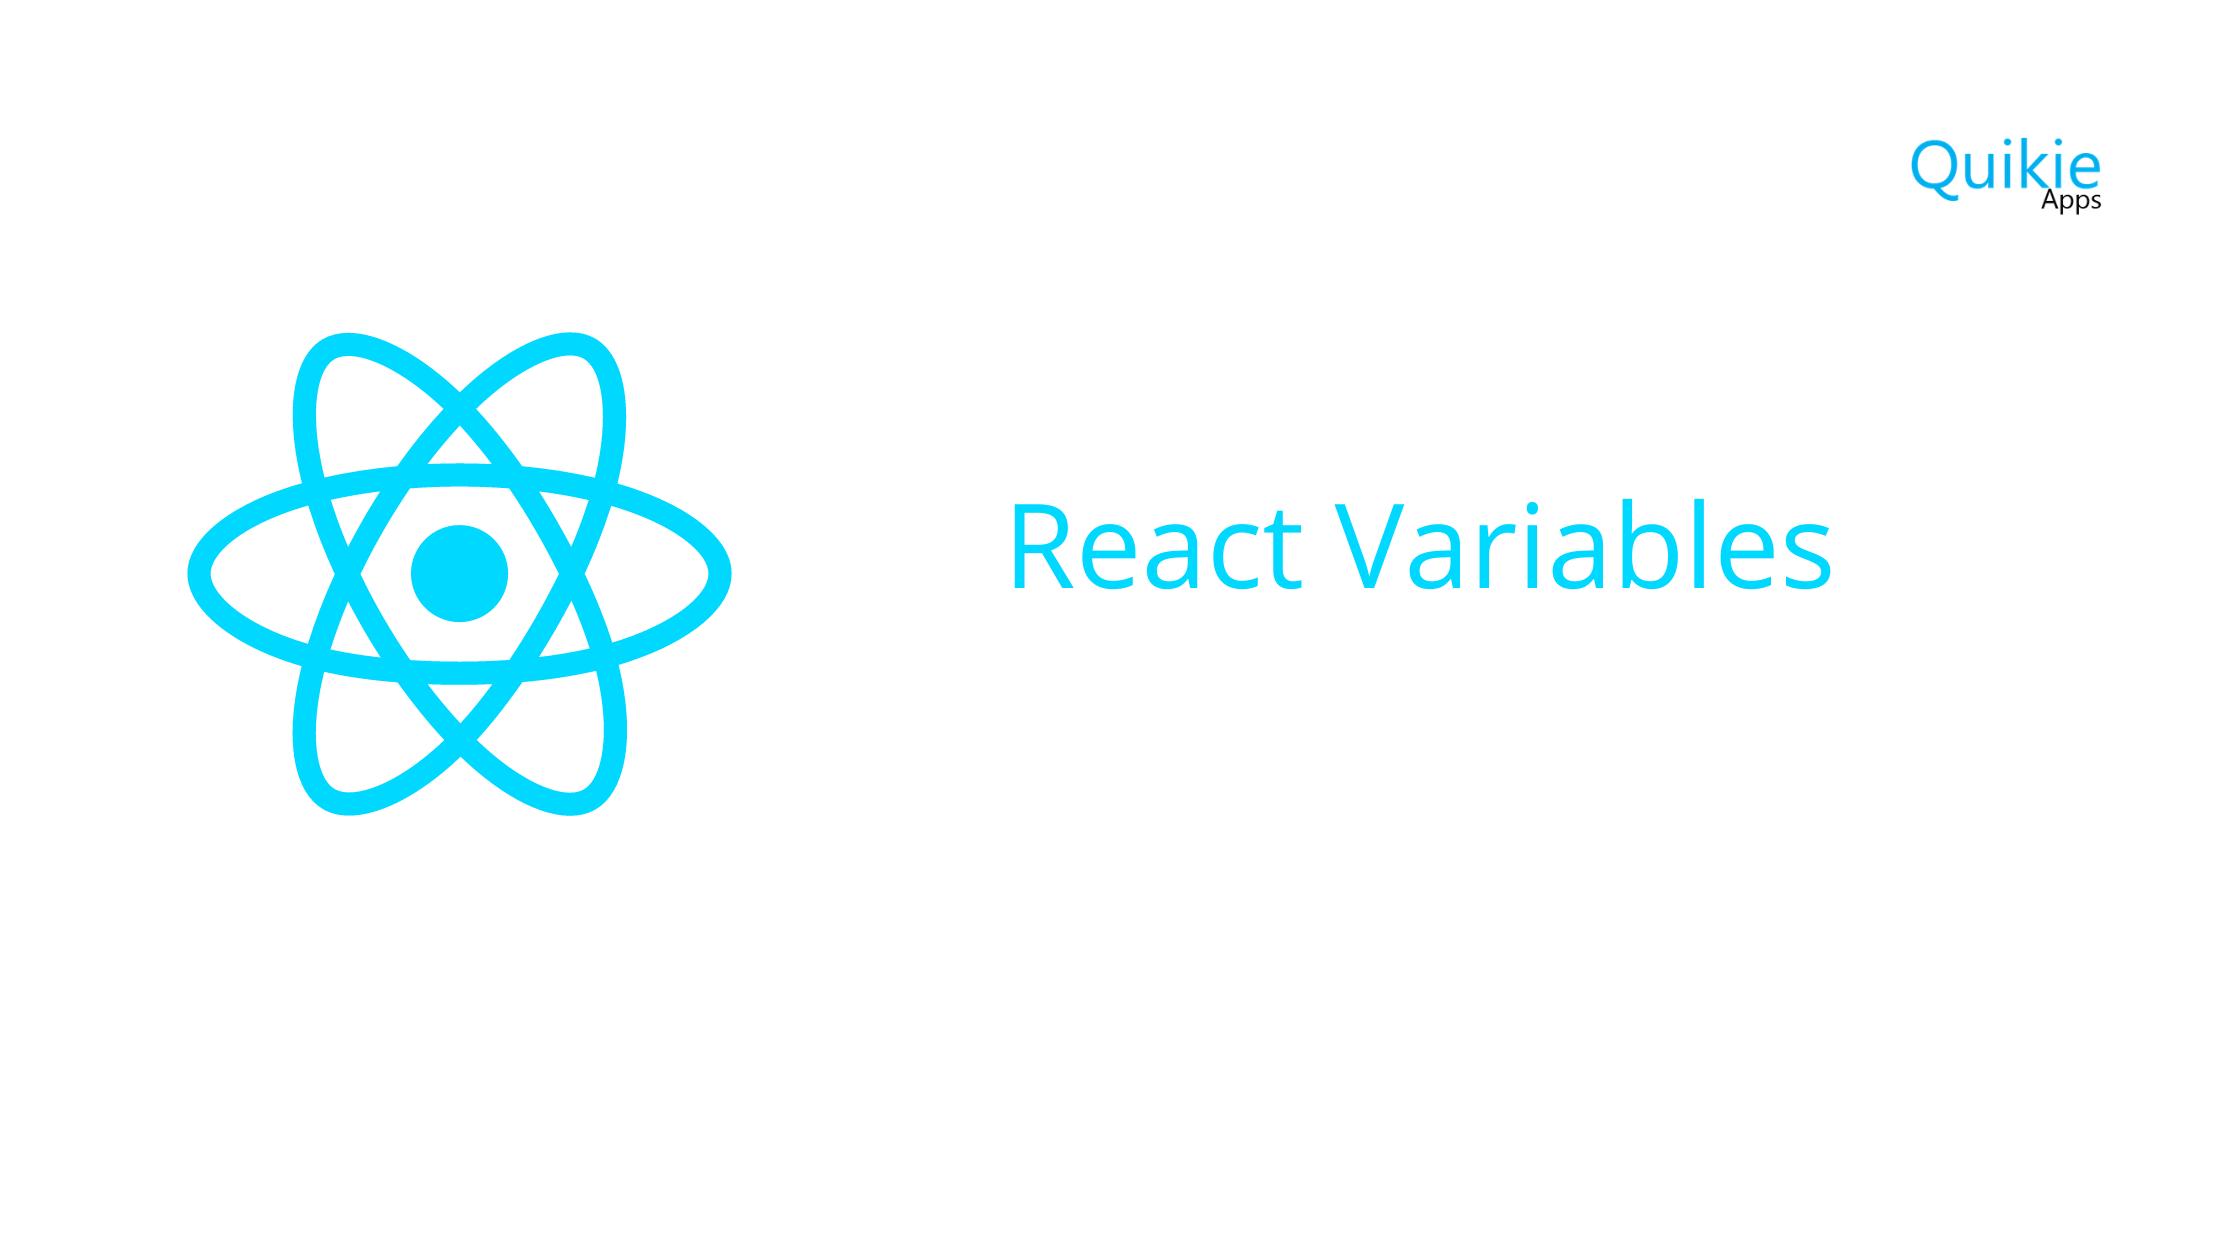 React Variables